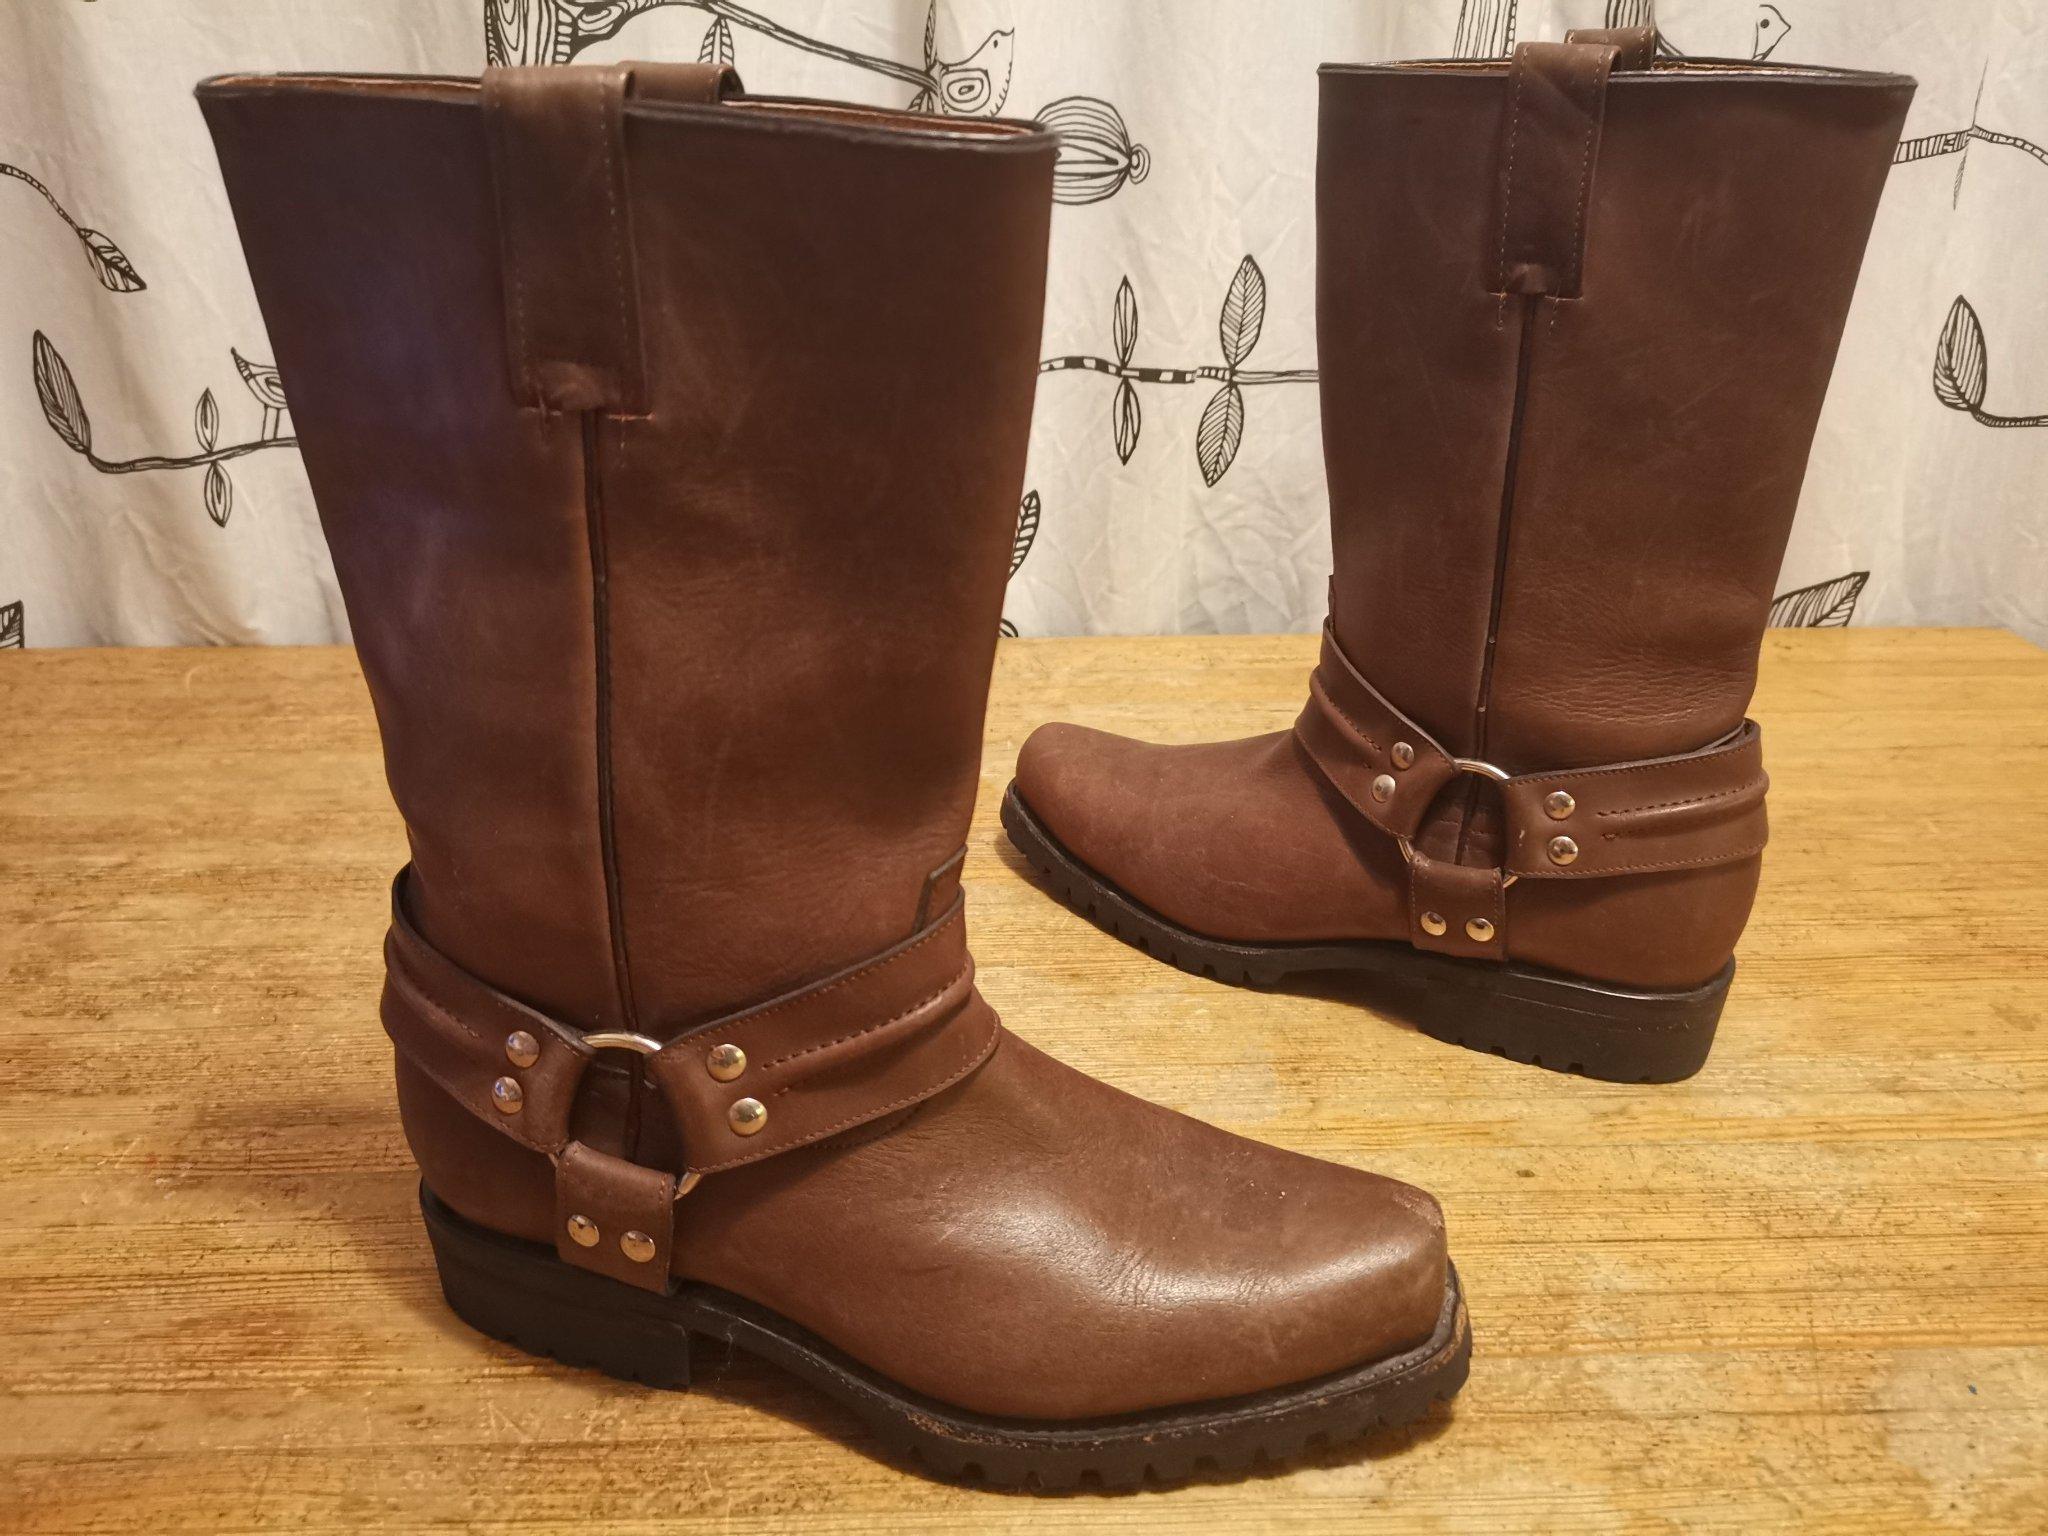 Bruna skinn MC boots African Boots MC stövlar str 42